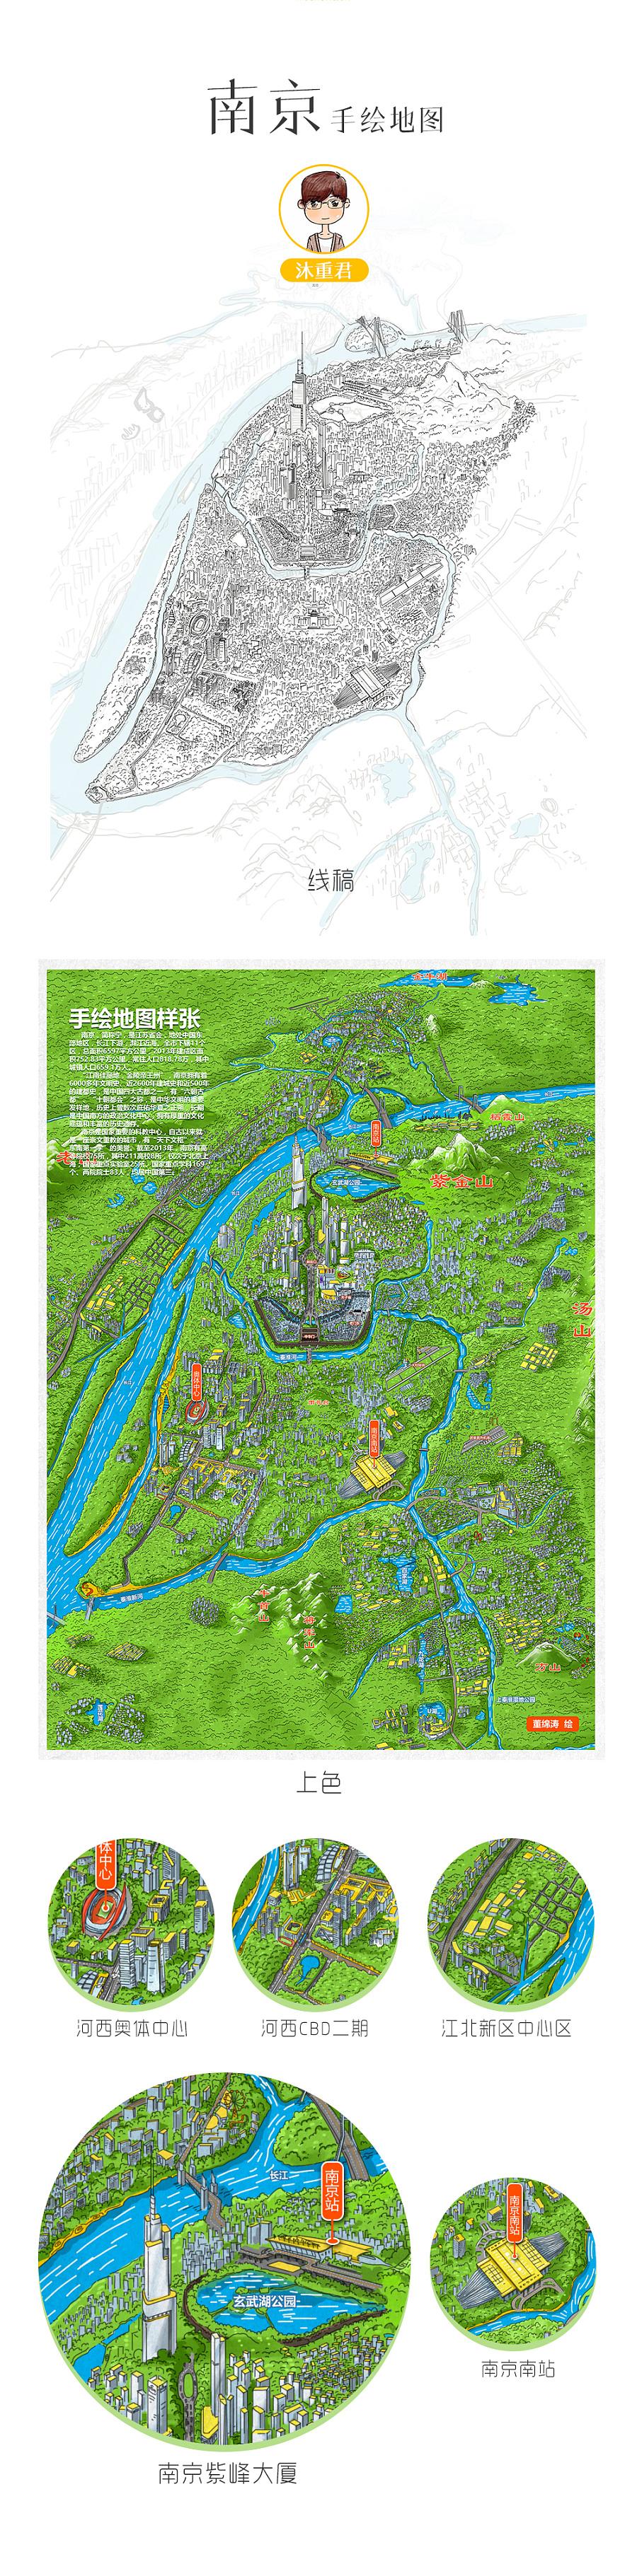 南京 手绘地图